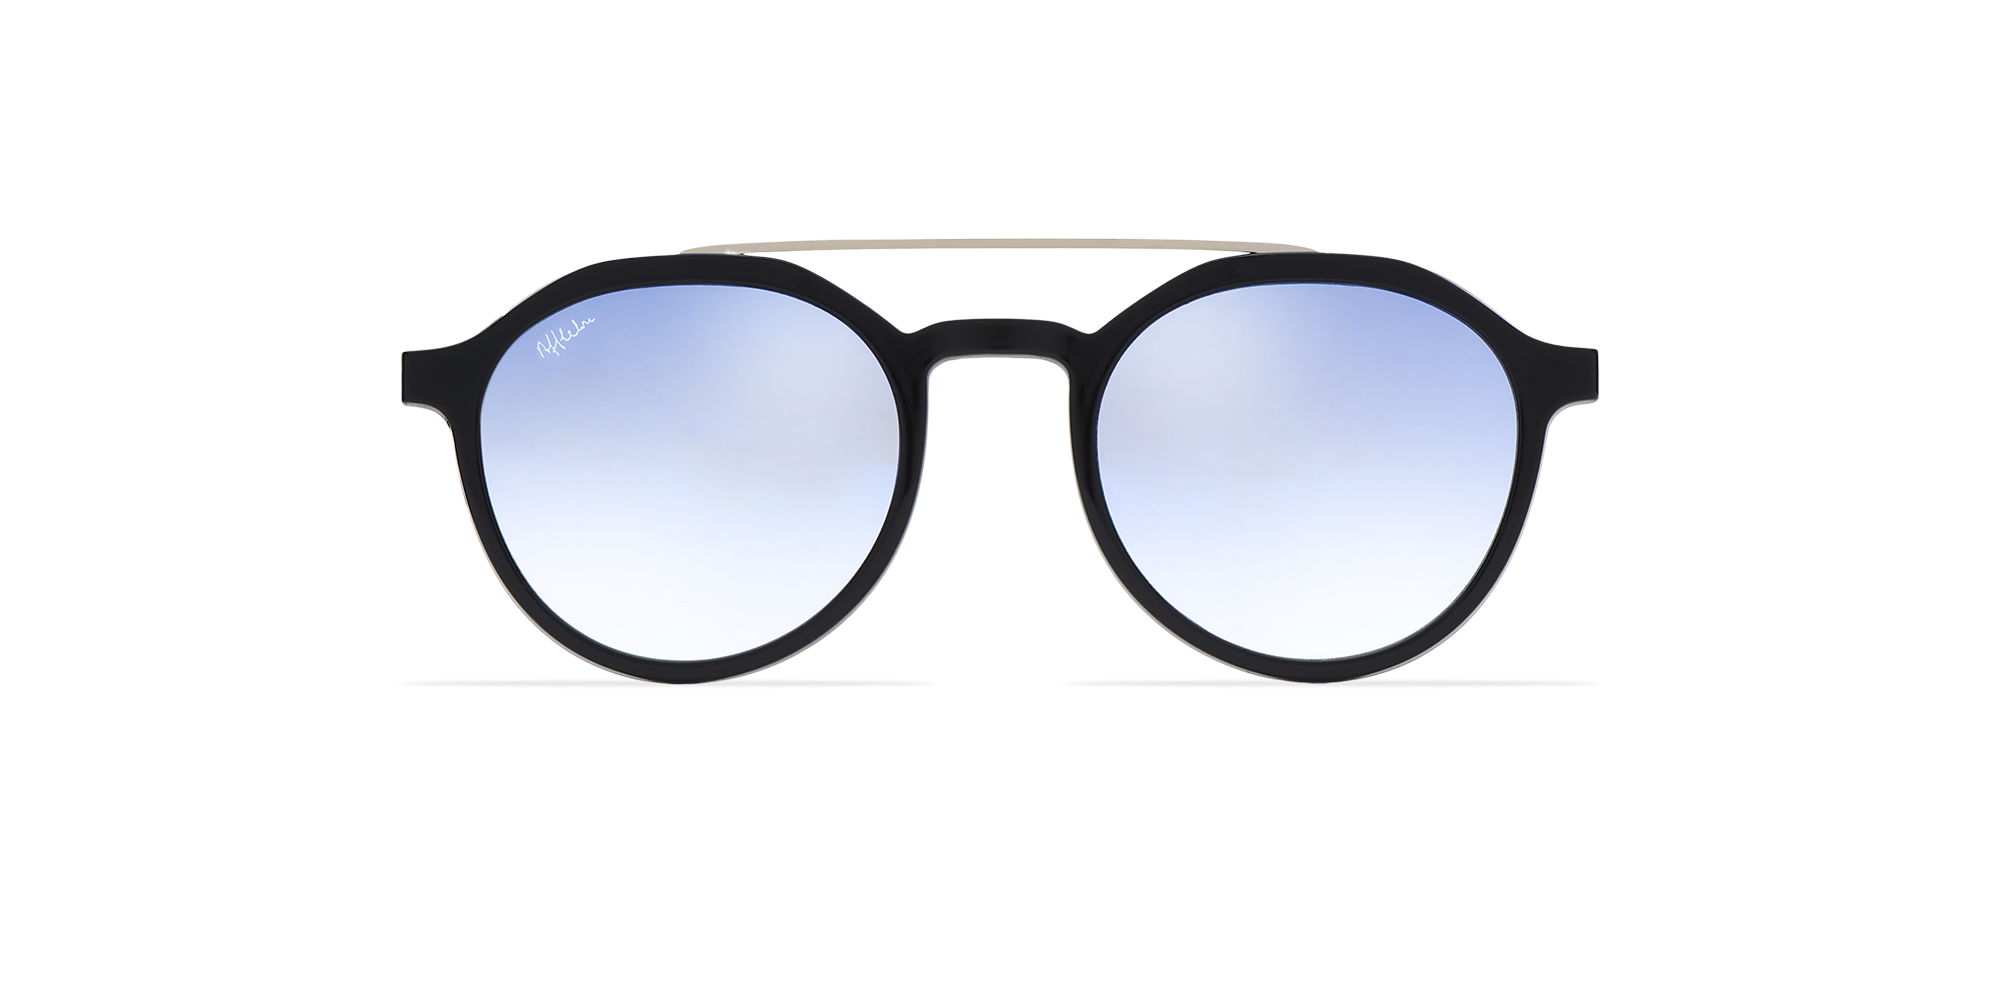 afflelou/france/products/smart_clip/clips_glasses/07630036429105_face.png